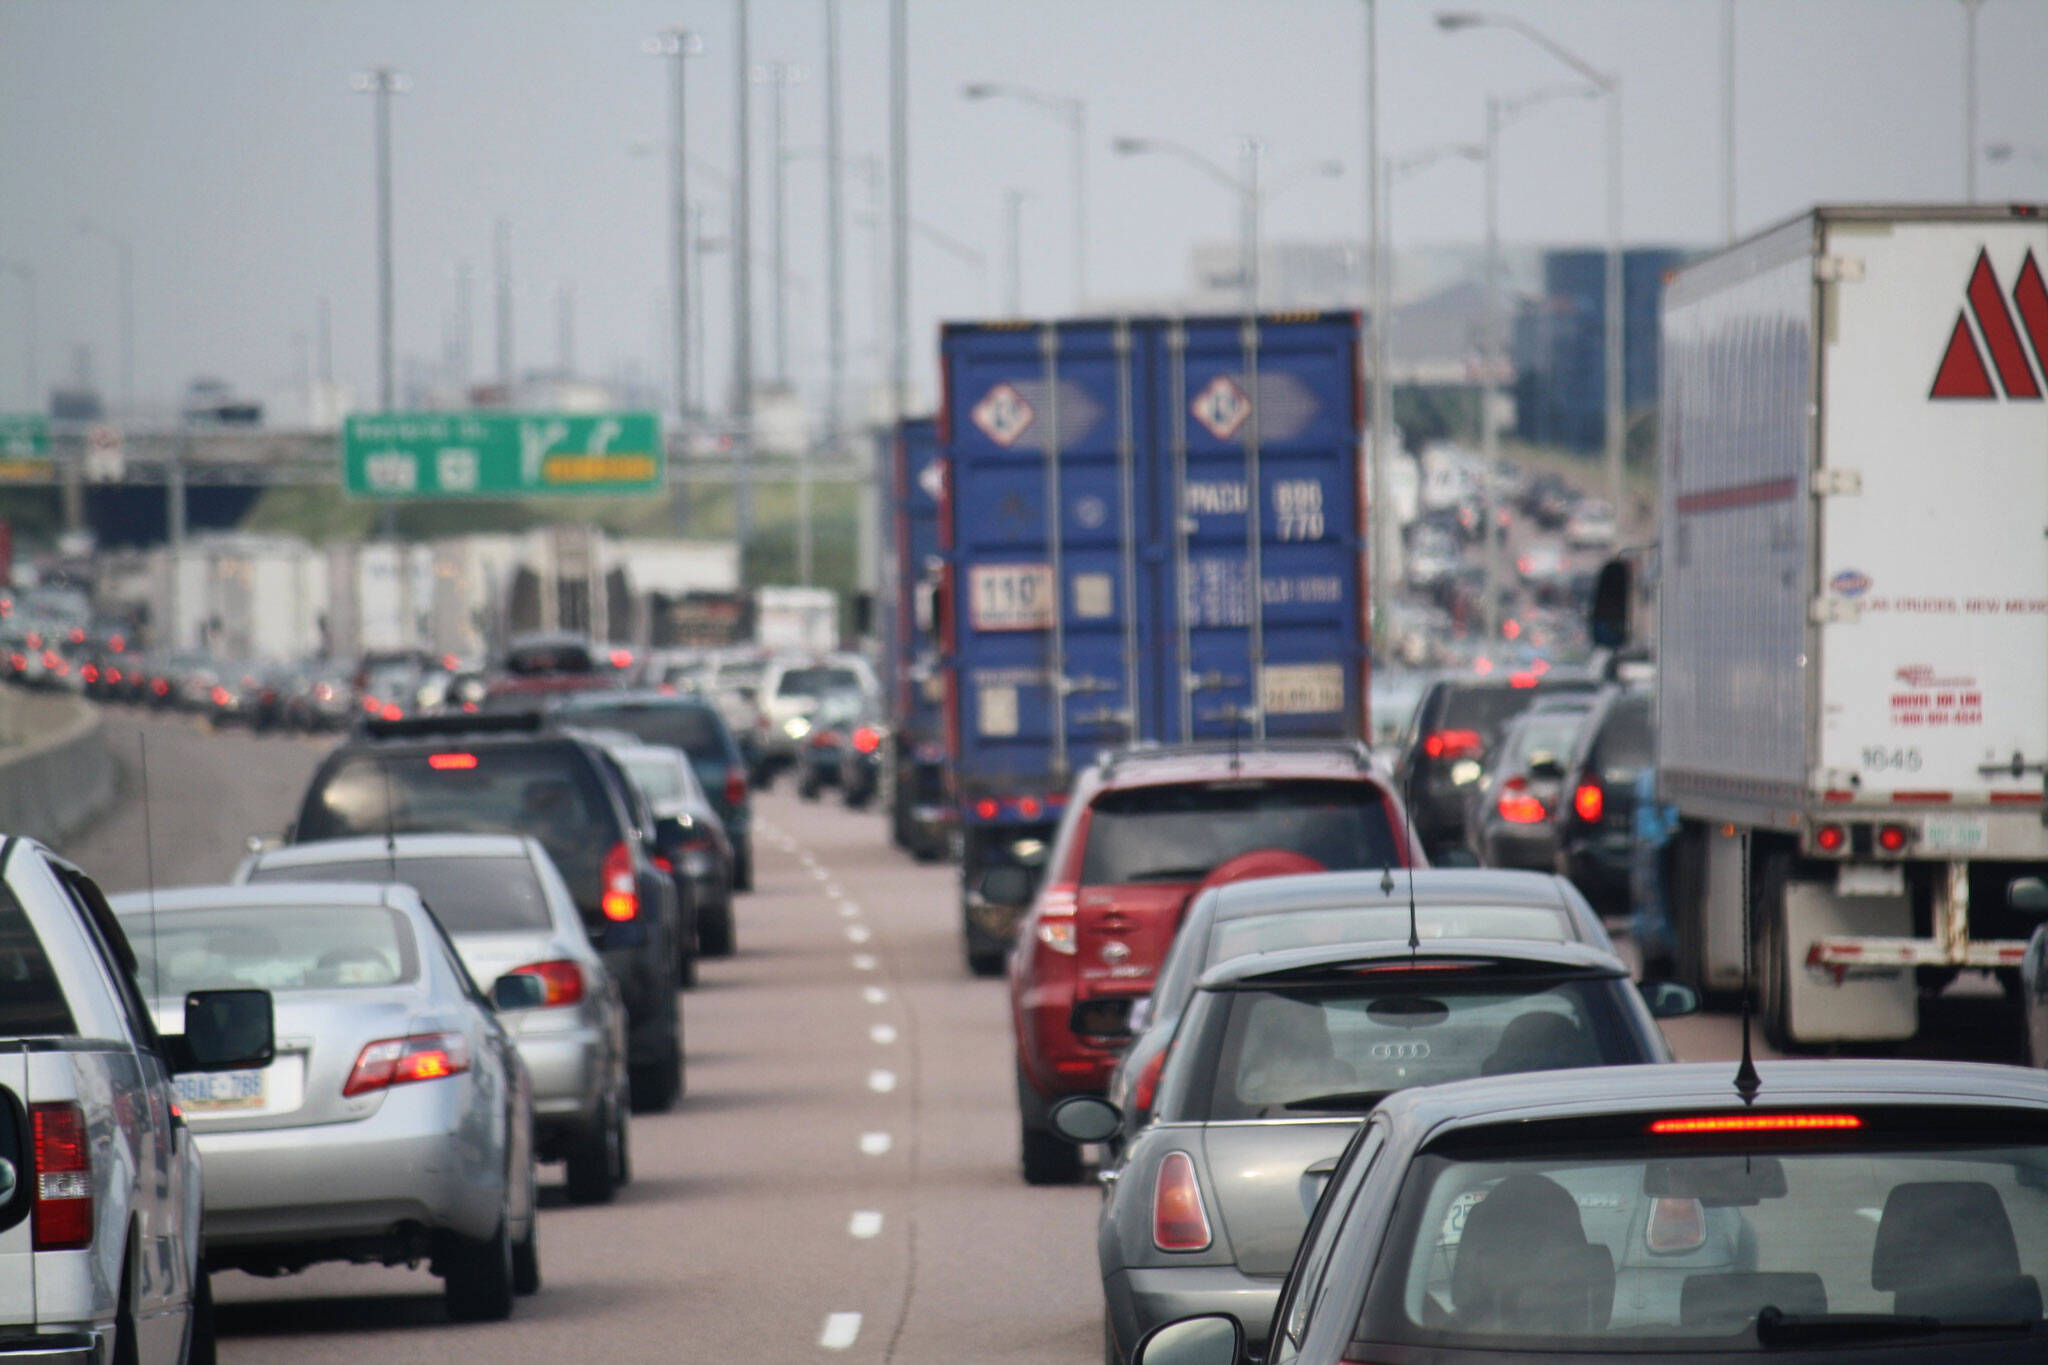 toronto 401 traffic